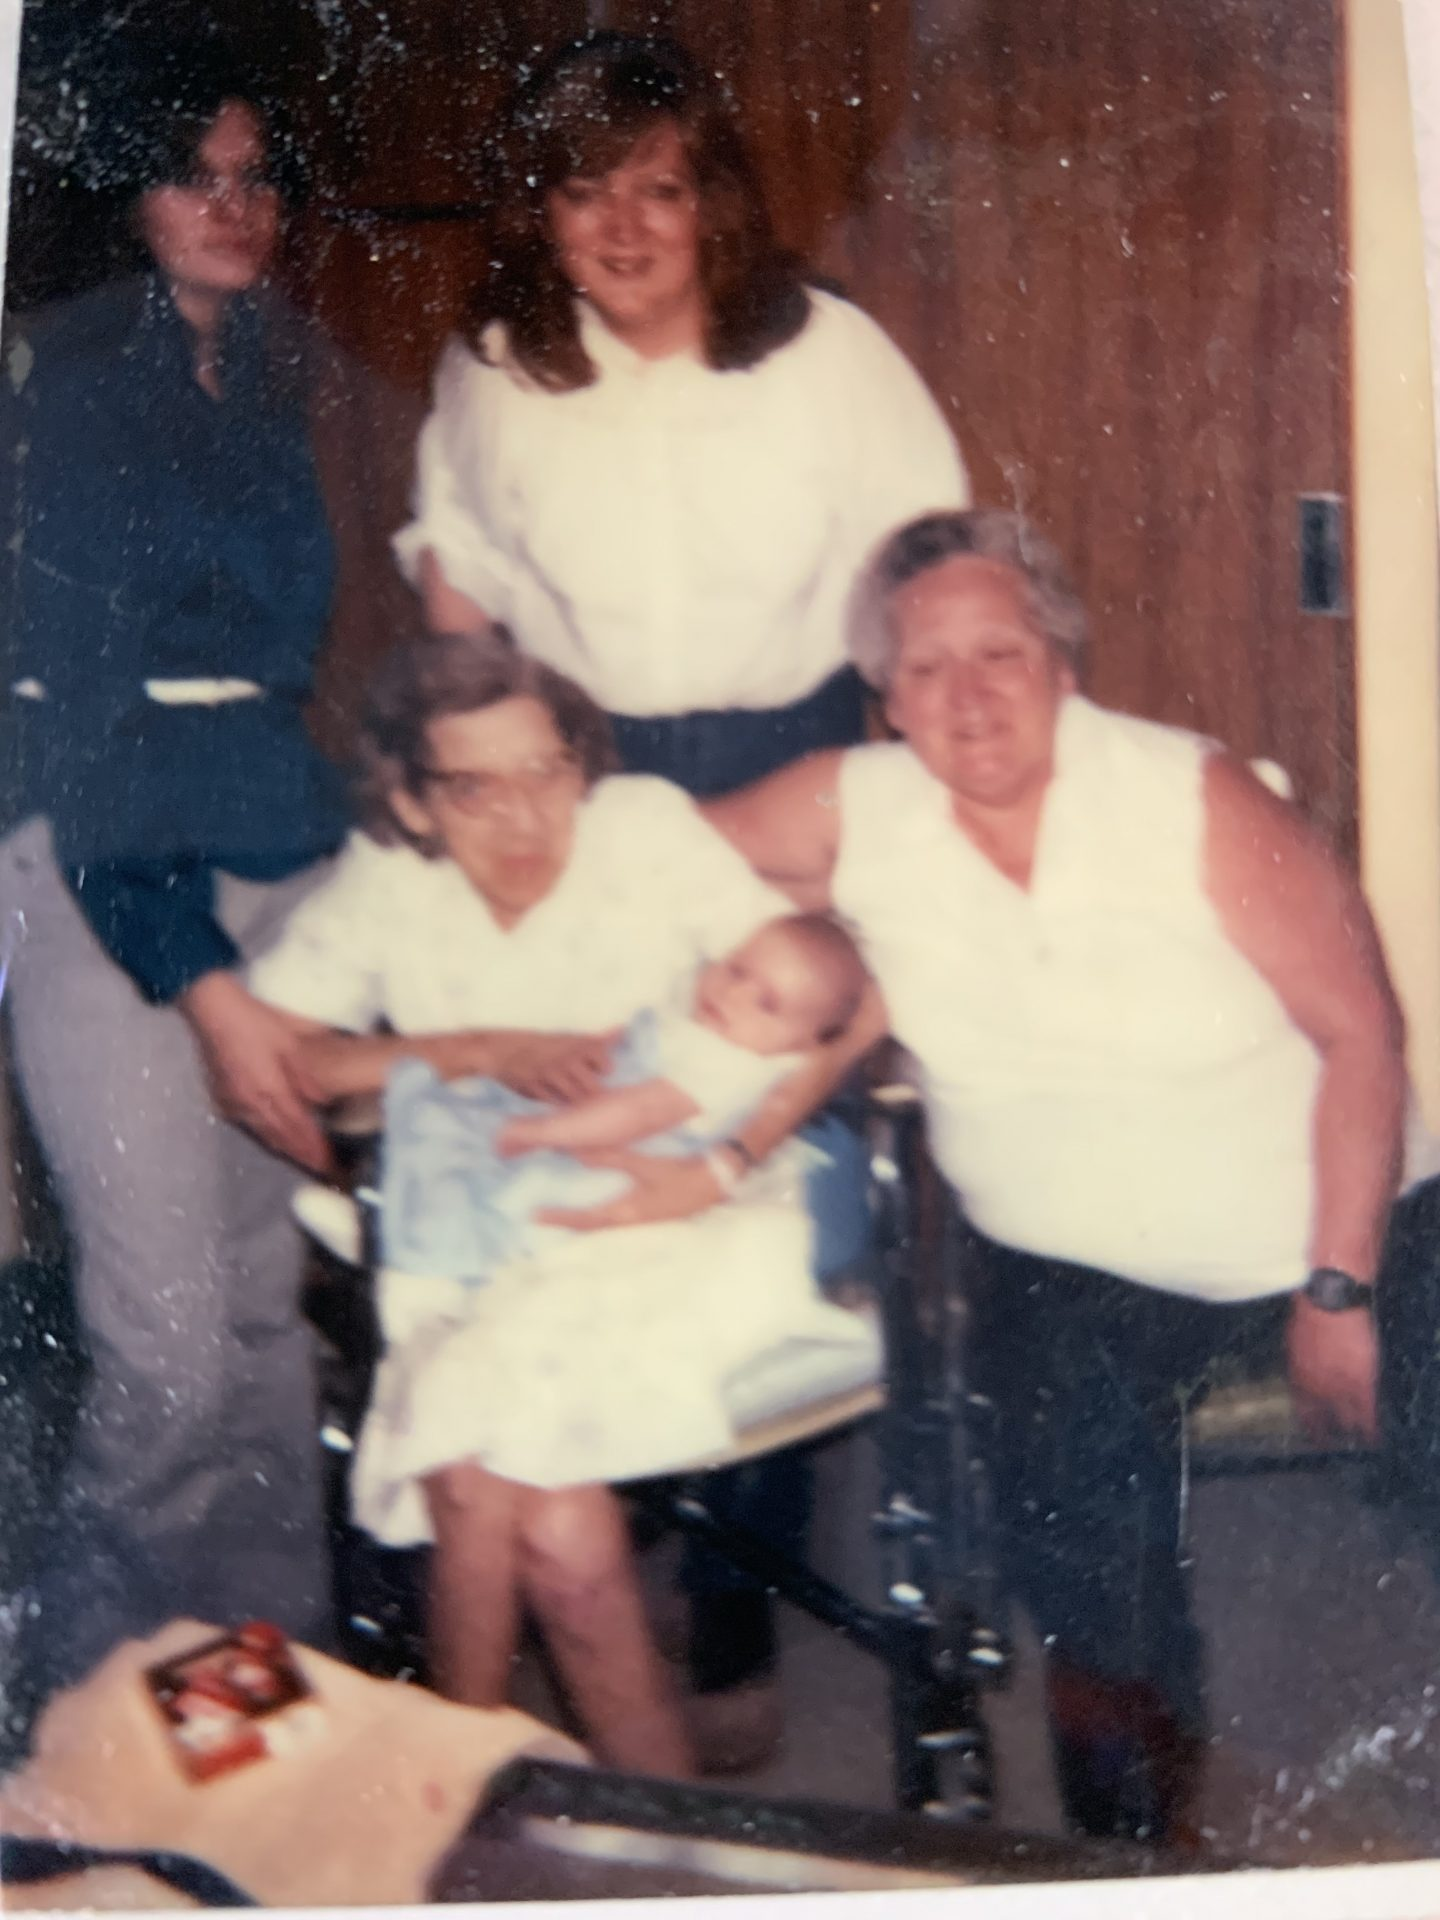 5 generations,  Grandma Hamilton, Grandma Shanahan, Mom, Tracie, and Jason